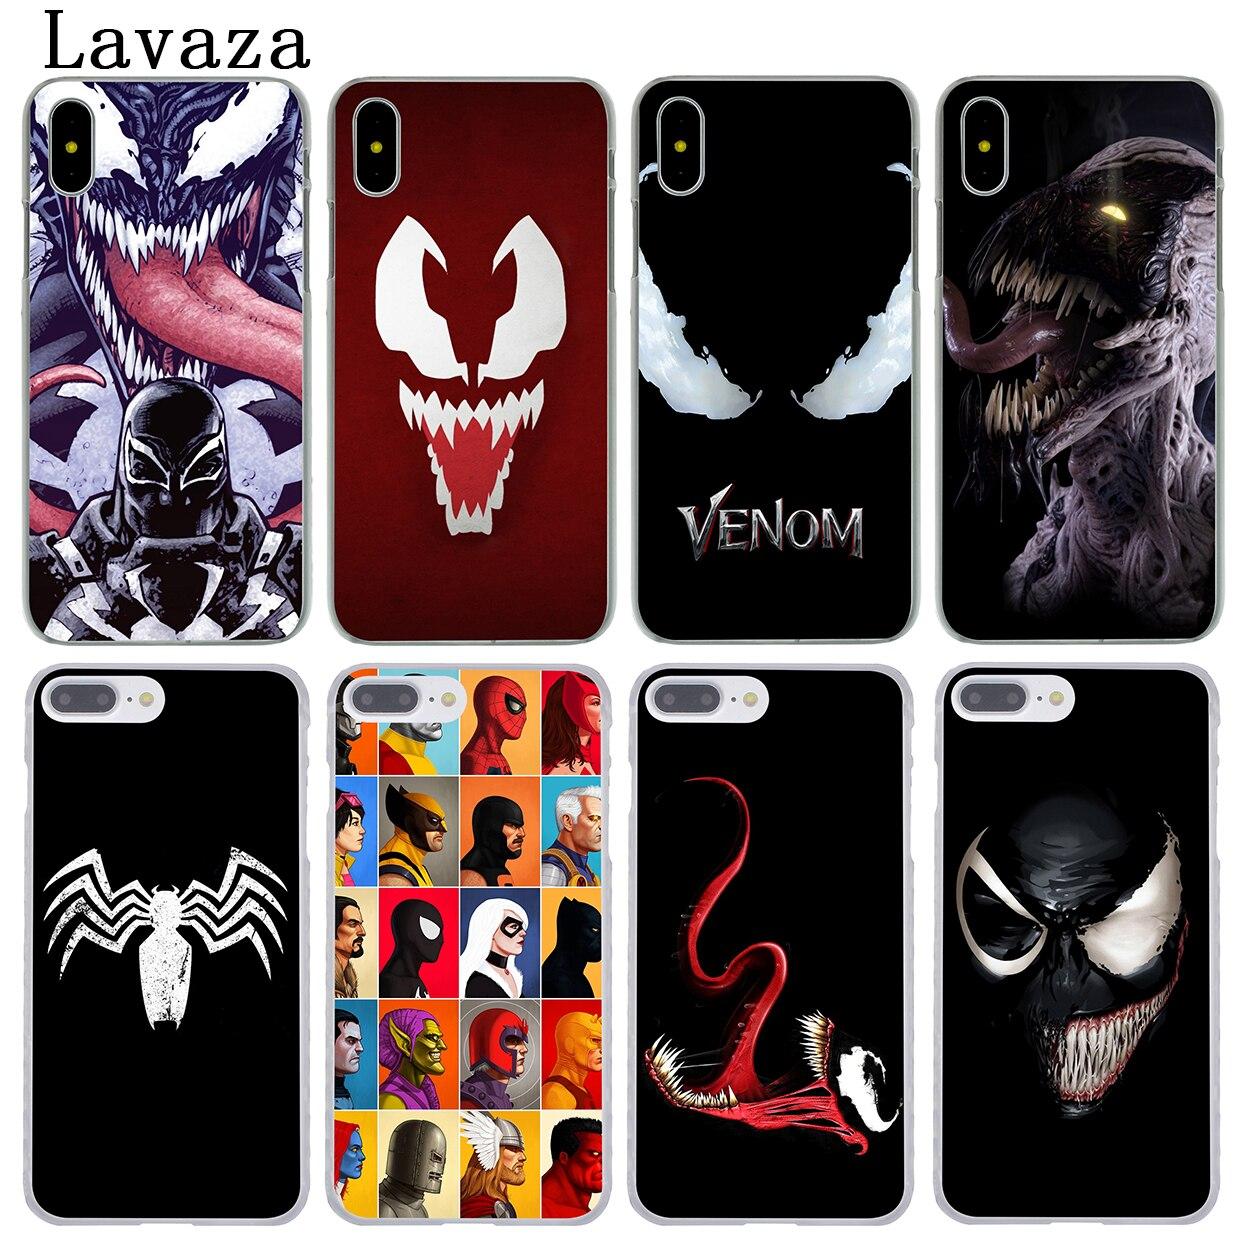 lavaza-venom-font-b-marvel-b-font-villain-hulk-hard-phone-cover-case-for-apple-iphone-xr-xs-max-x-8-7-6-6s-plus-5-5s-se-5c-4s-10-cases-8plus